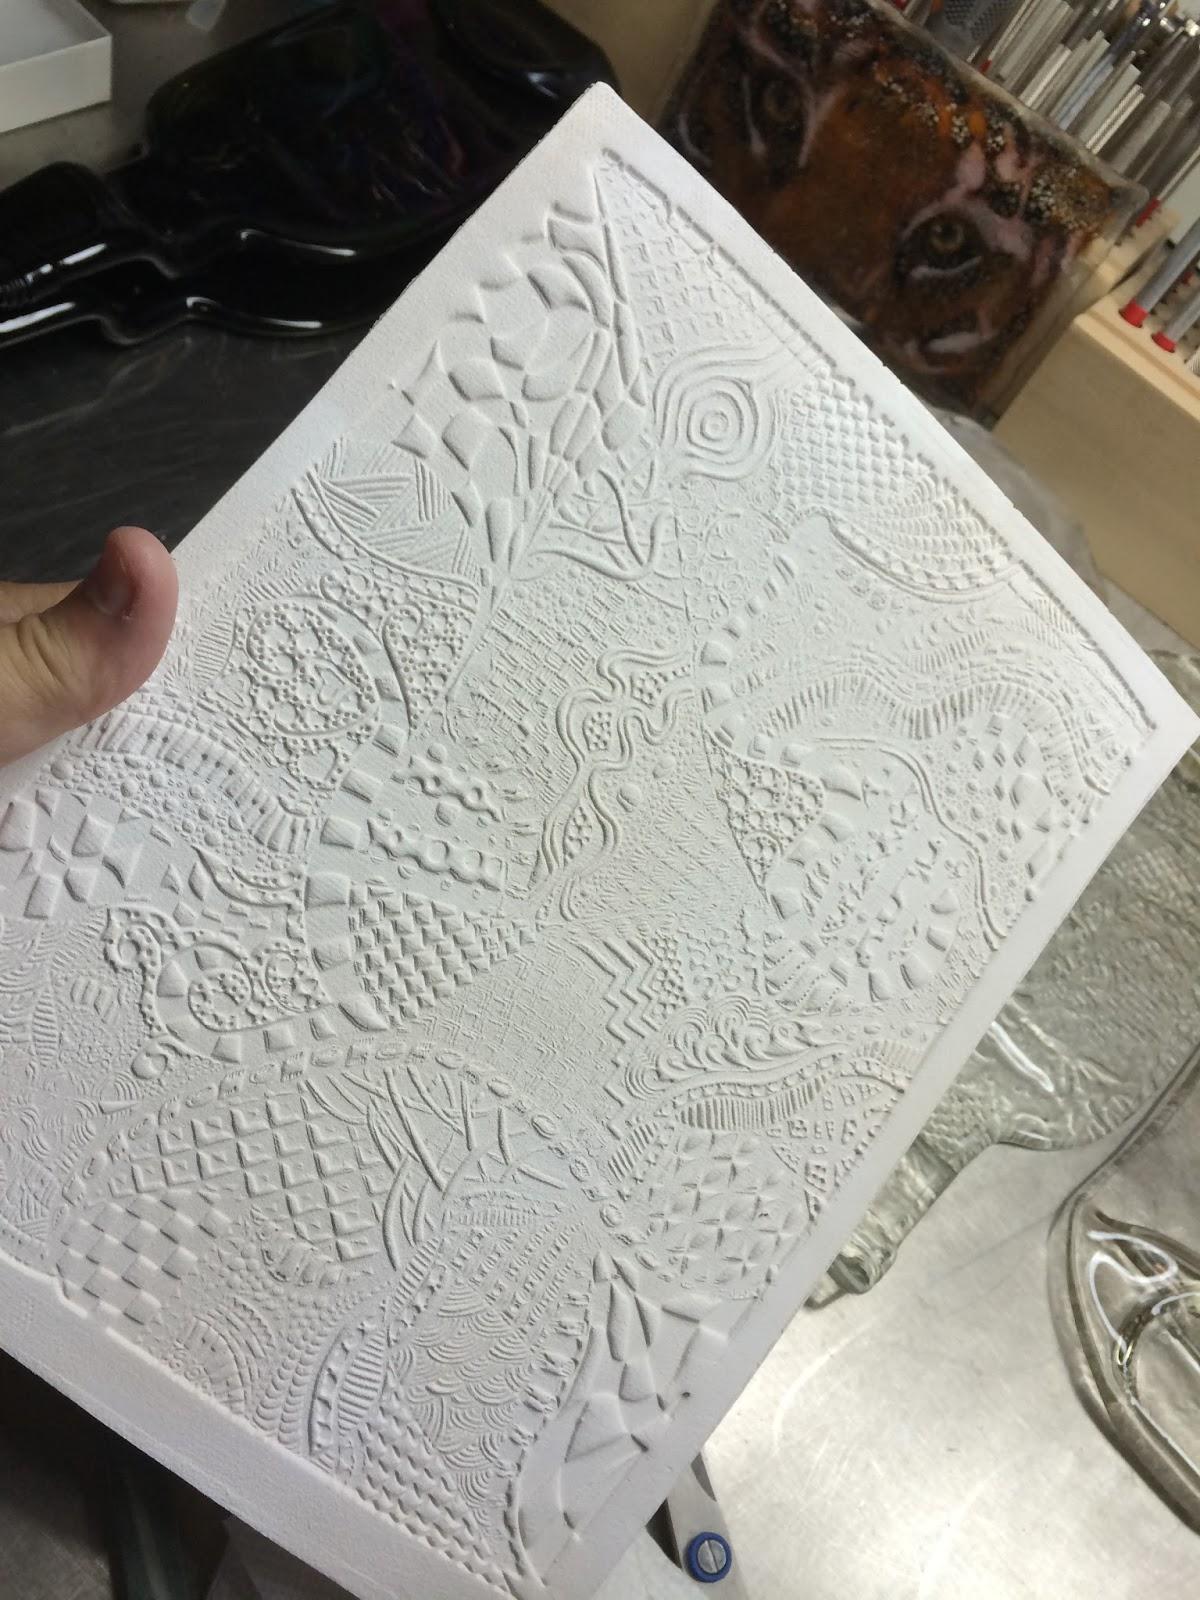 Deborhread september 2015 making a ceramic tile for slumping dailygadgetfo Choice Image